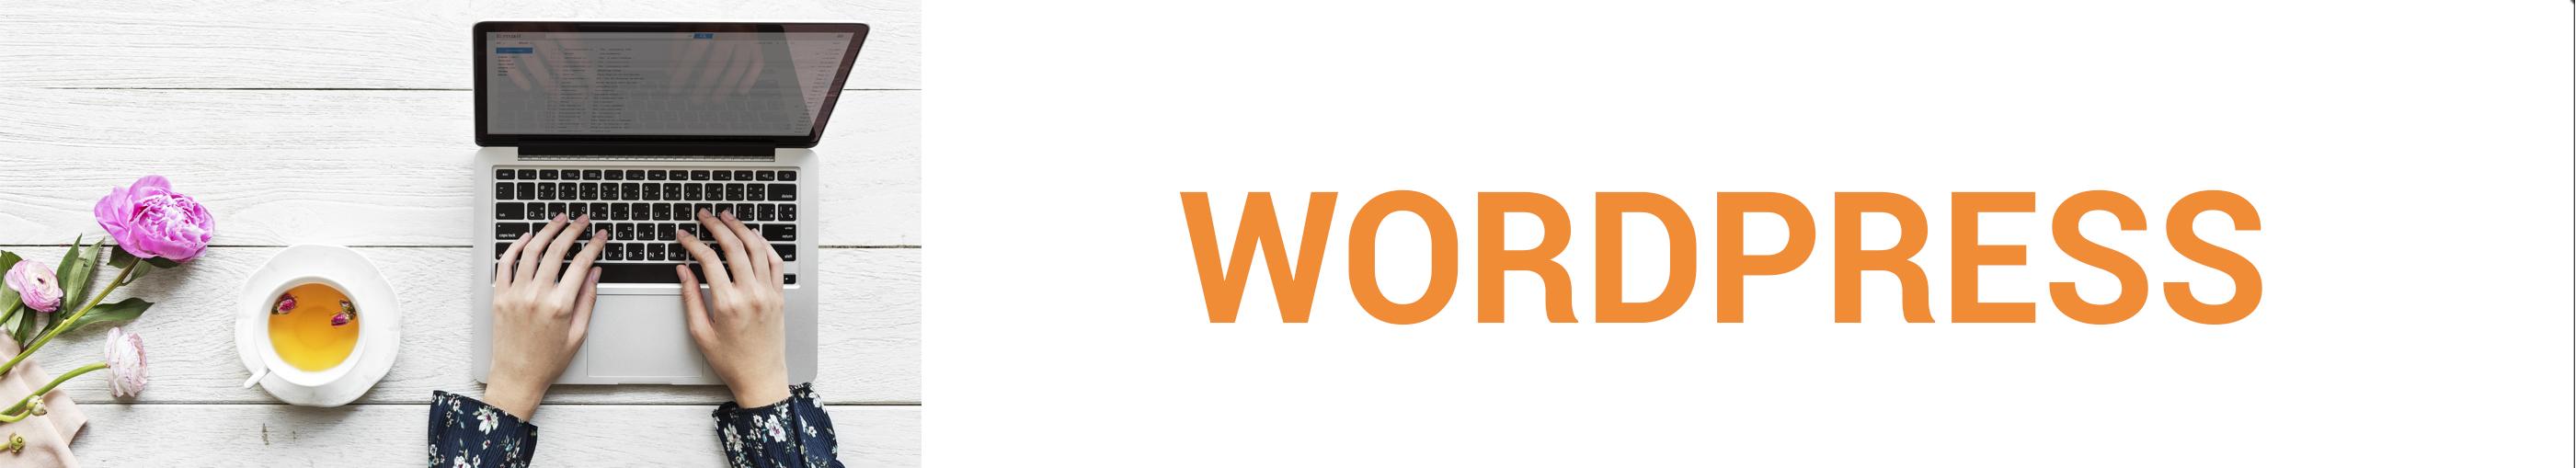 Wordpress Platform - STAAH